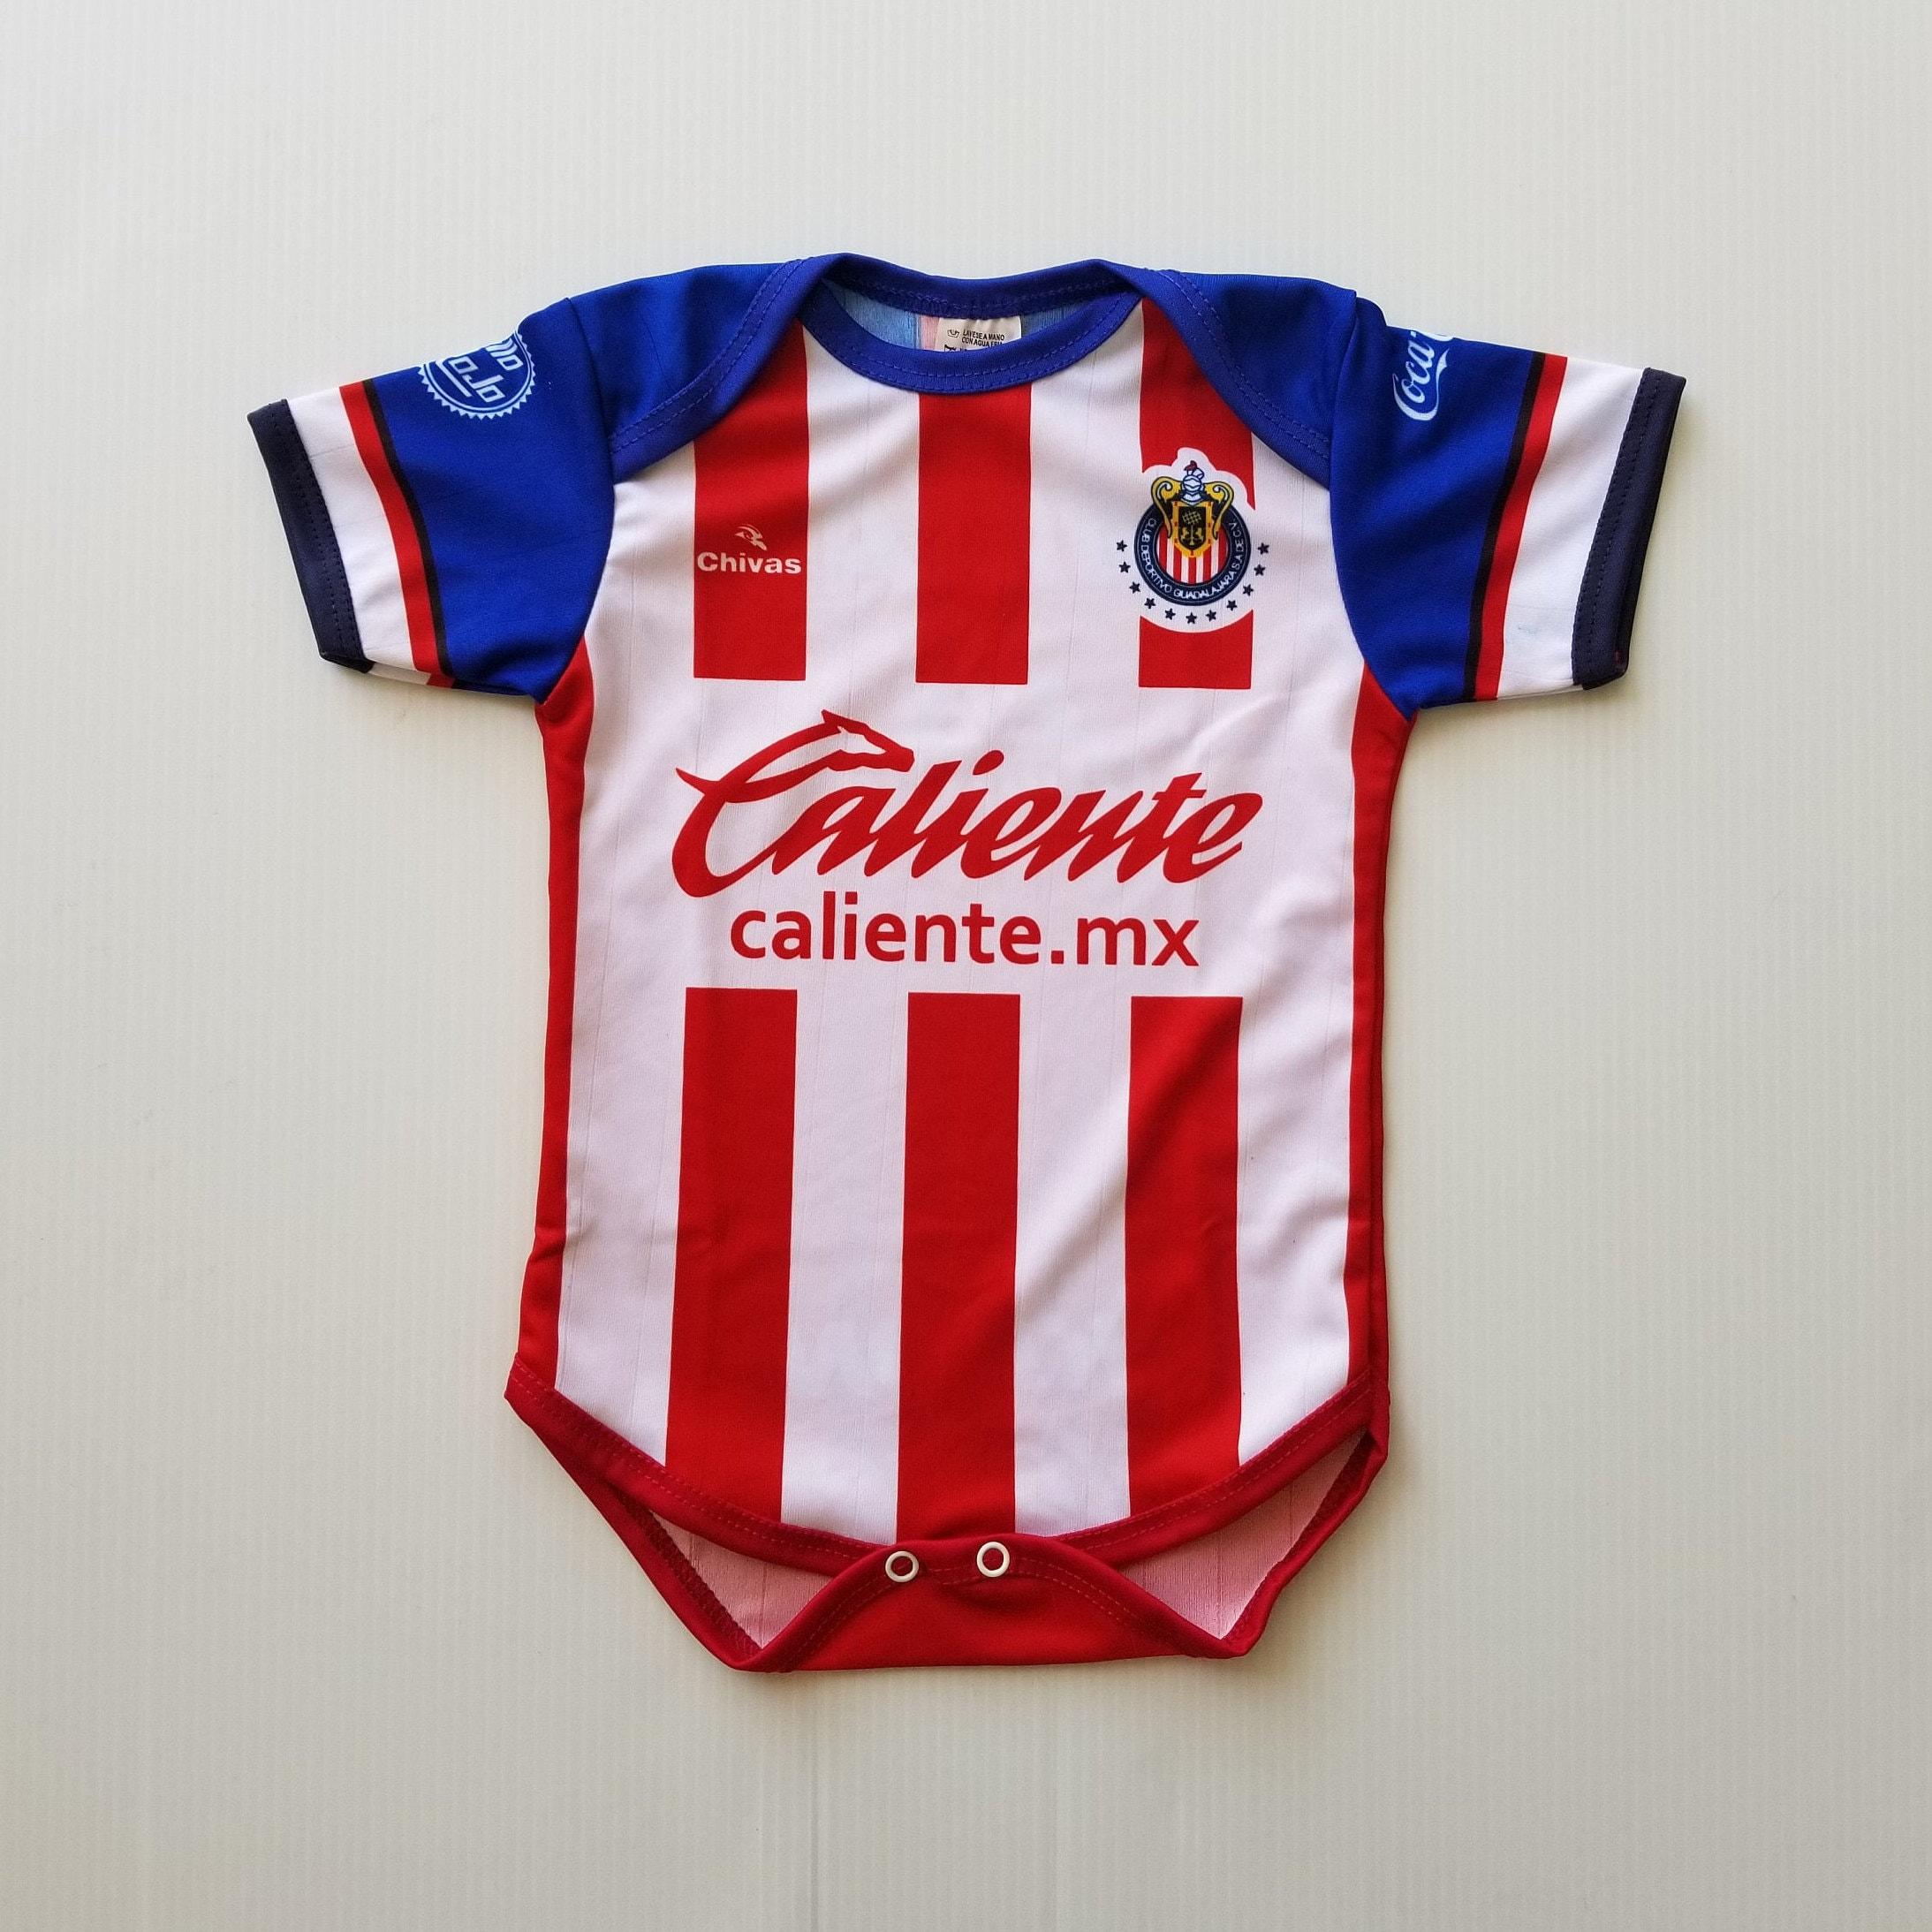 Chivas Baby Jersey, Soccer Jersey, Baby Bodysuit, Chivas de Guadalajara  2019-2020 Home Jersey